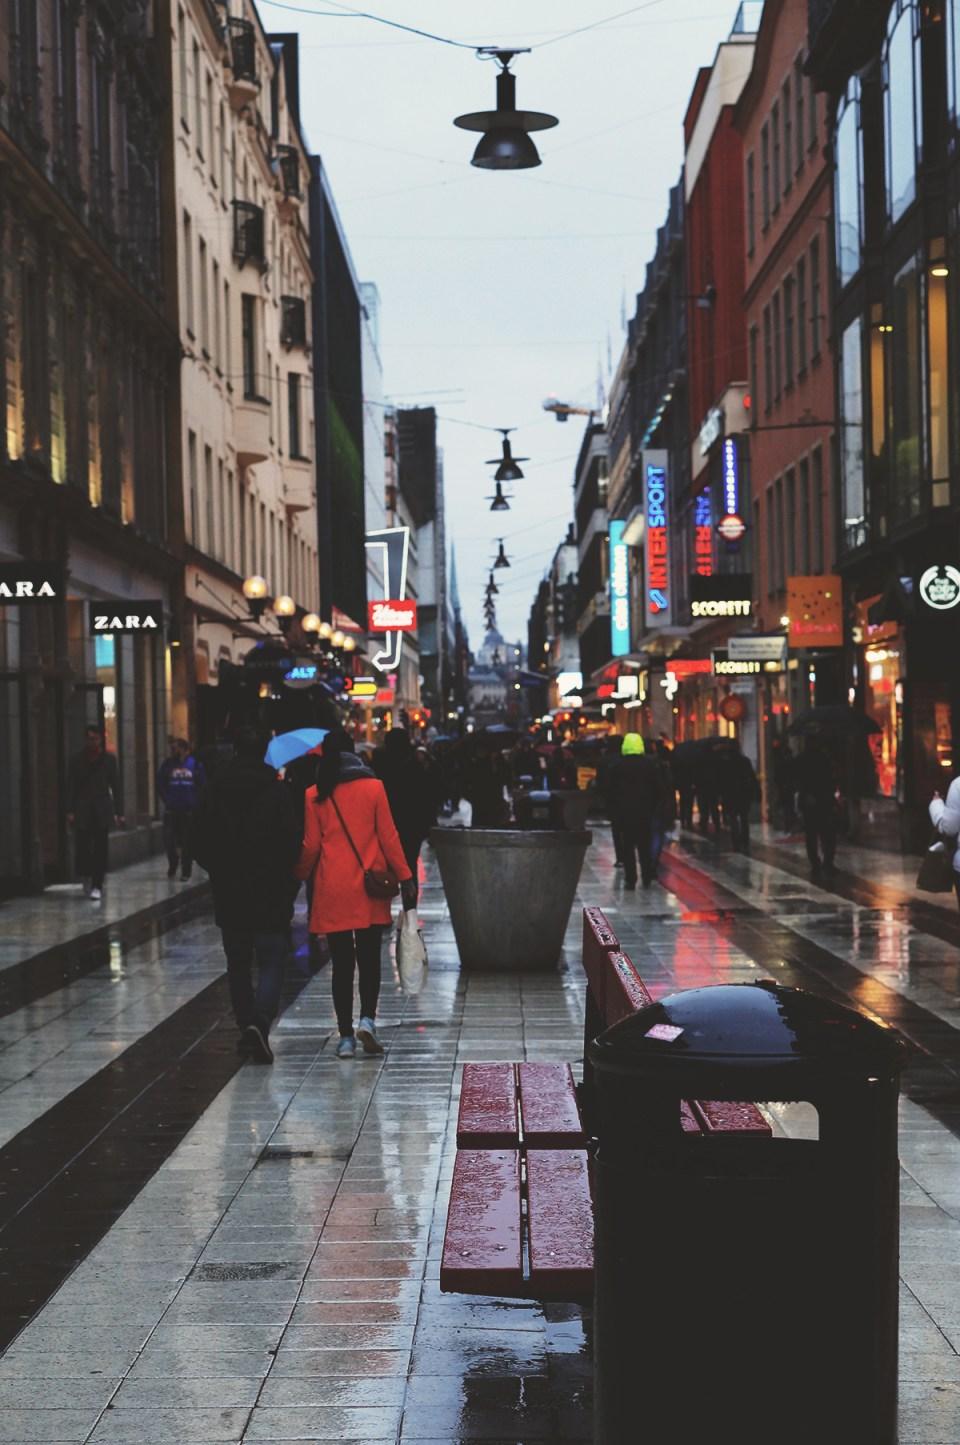 Shoppegate i Stockholm i regnet. Carina Behrens - carinabehrens.com